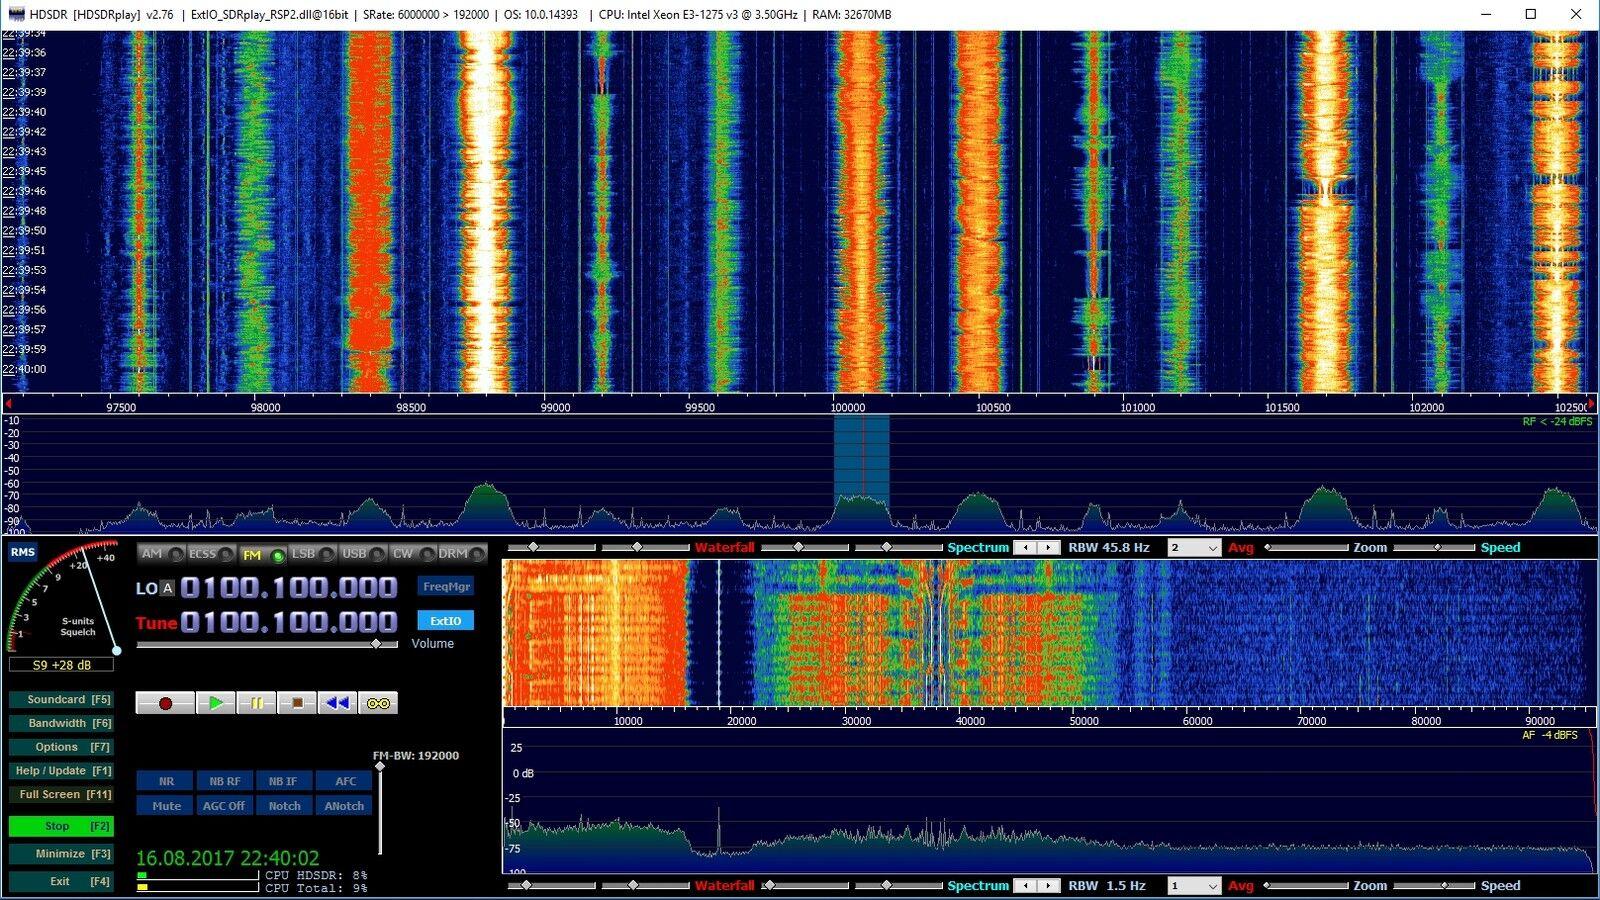 Reviews: Sdrplay Rsp2pro 1 kHz - 2ghz SDR Receiver Pro Model in